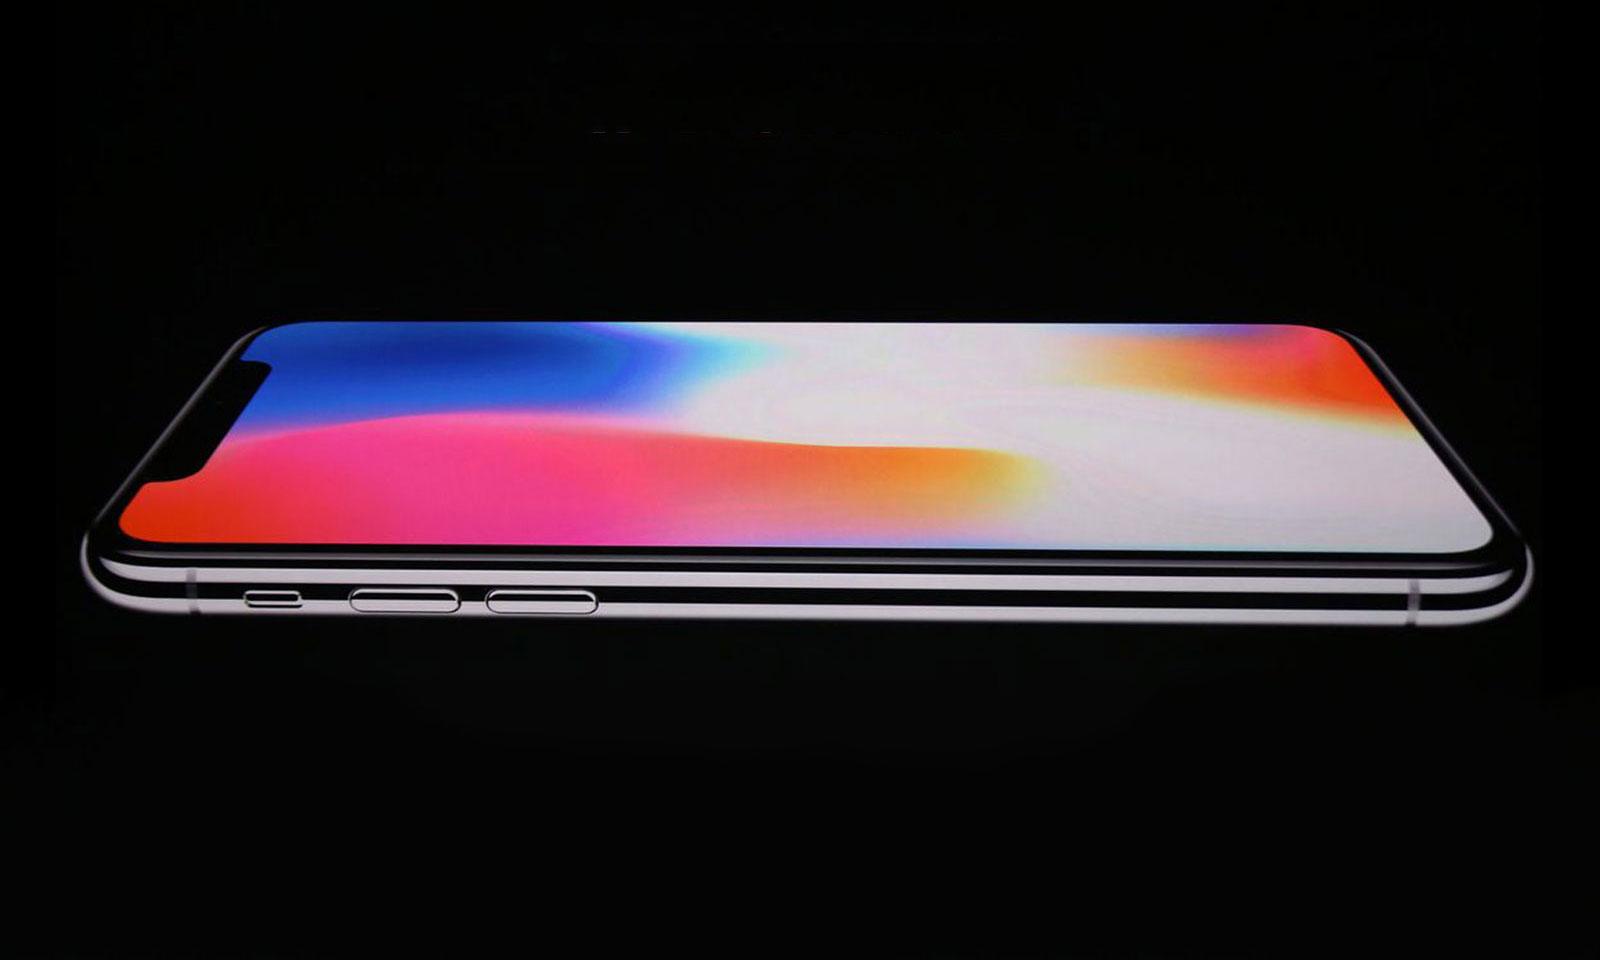 L'iPhone-X d'Apple